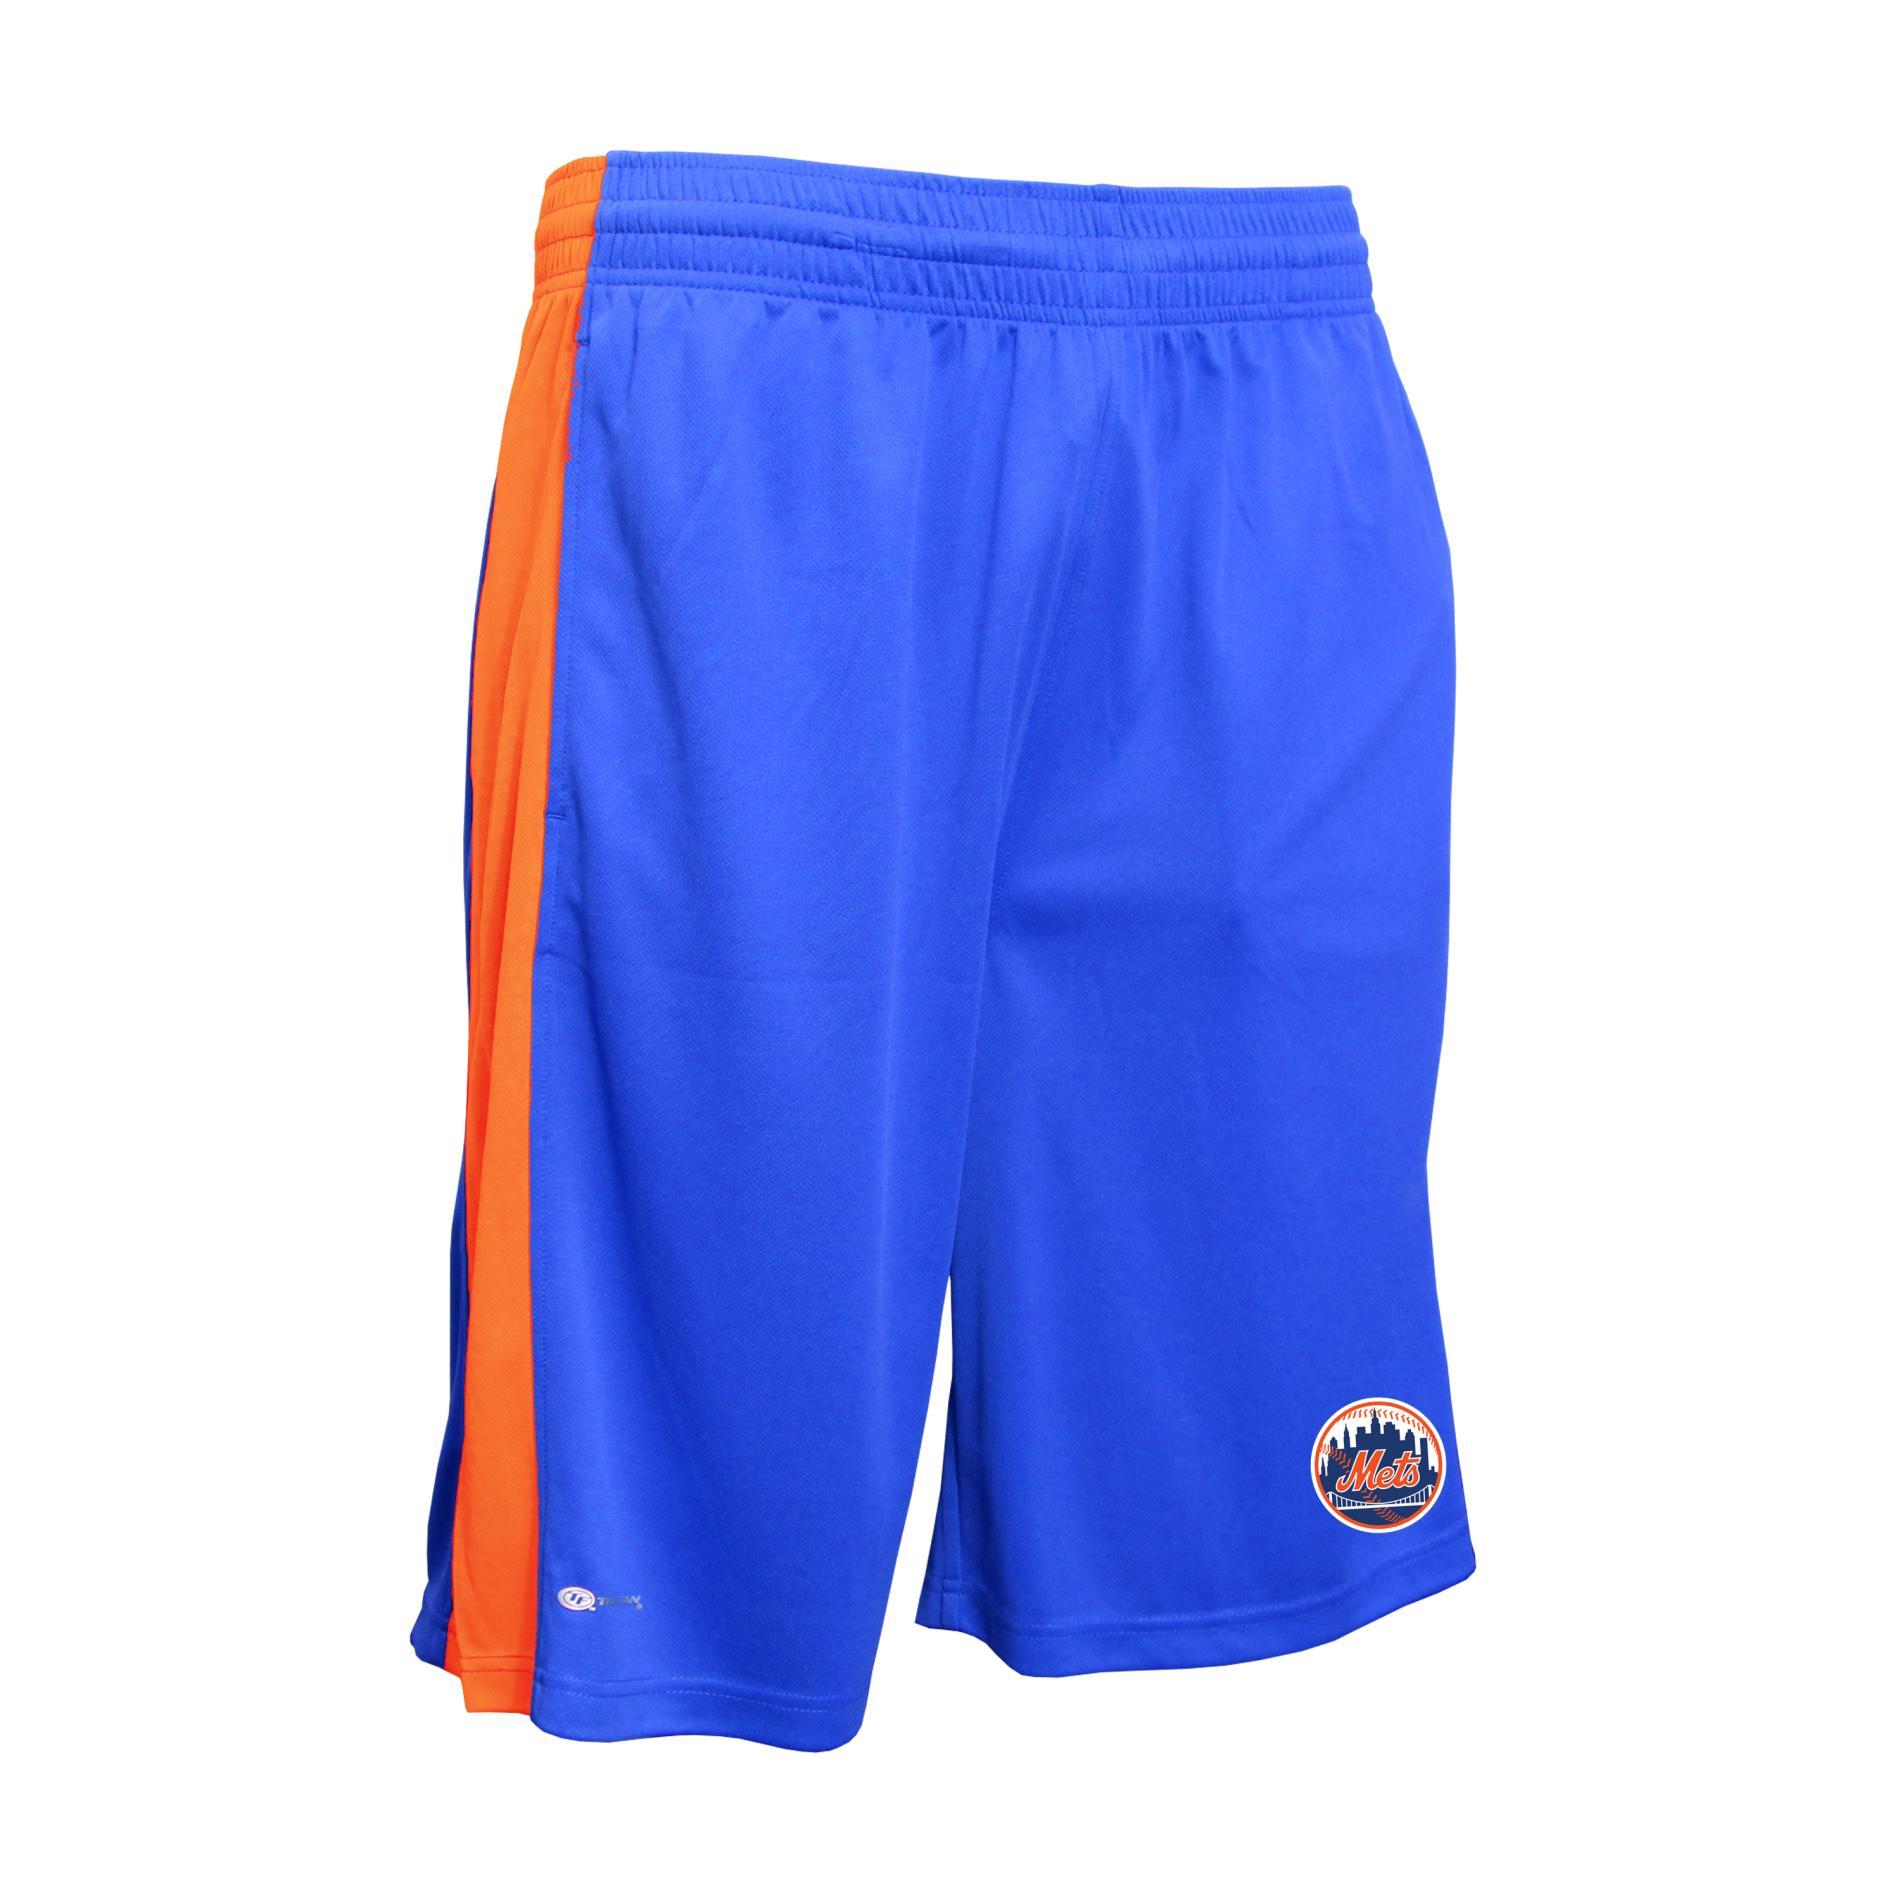 MLB Men's Athletic Shorts - New York Mets